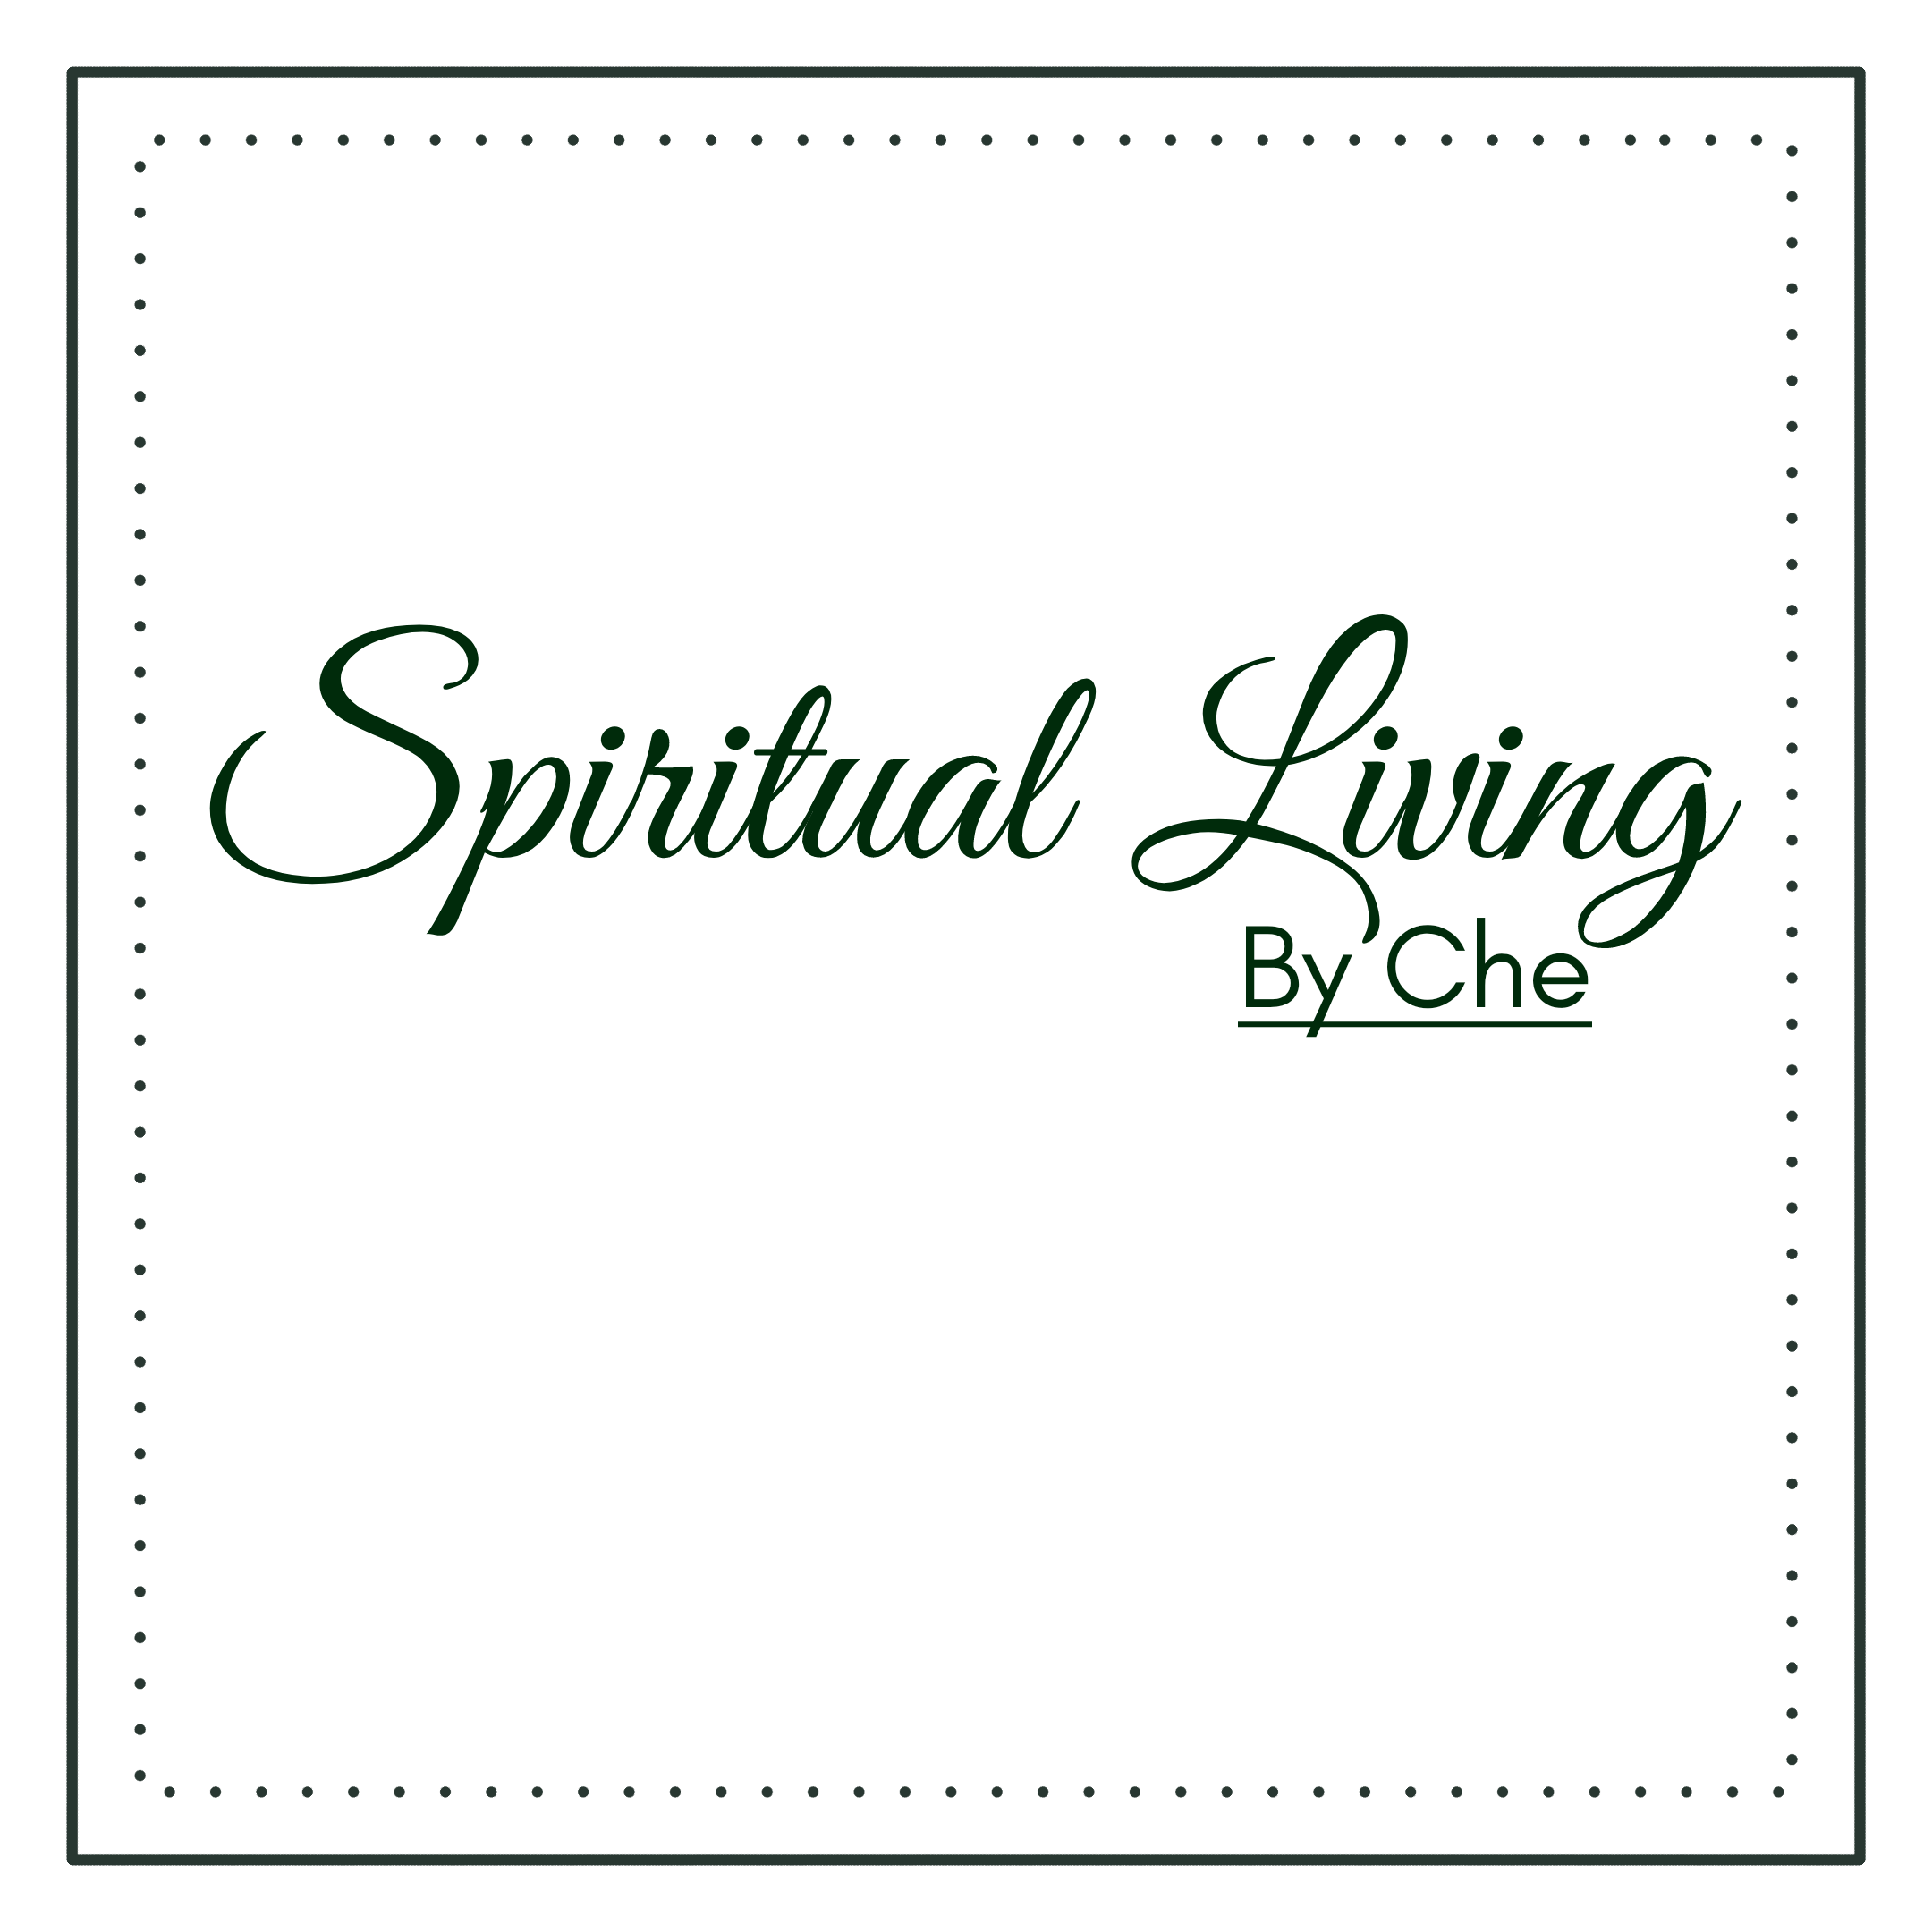 Spiritual Living by Che